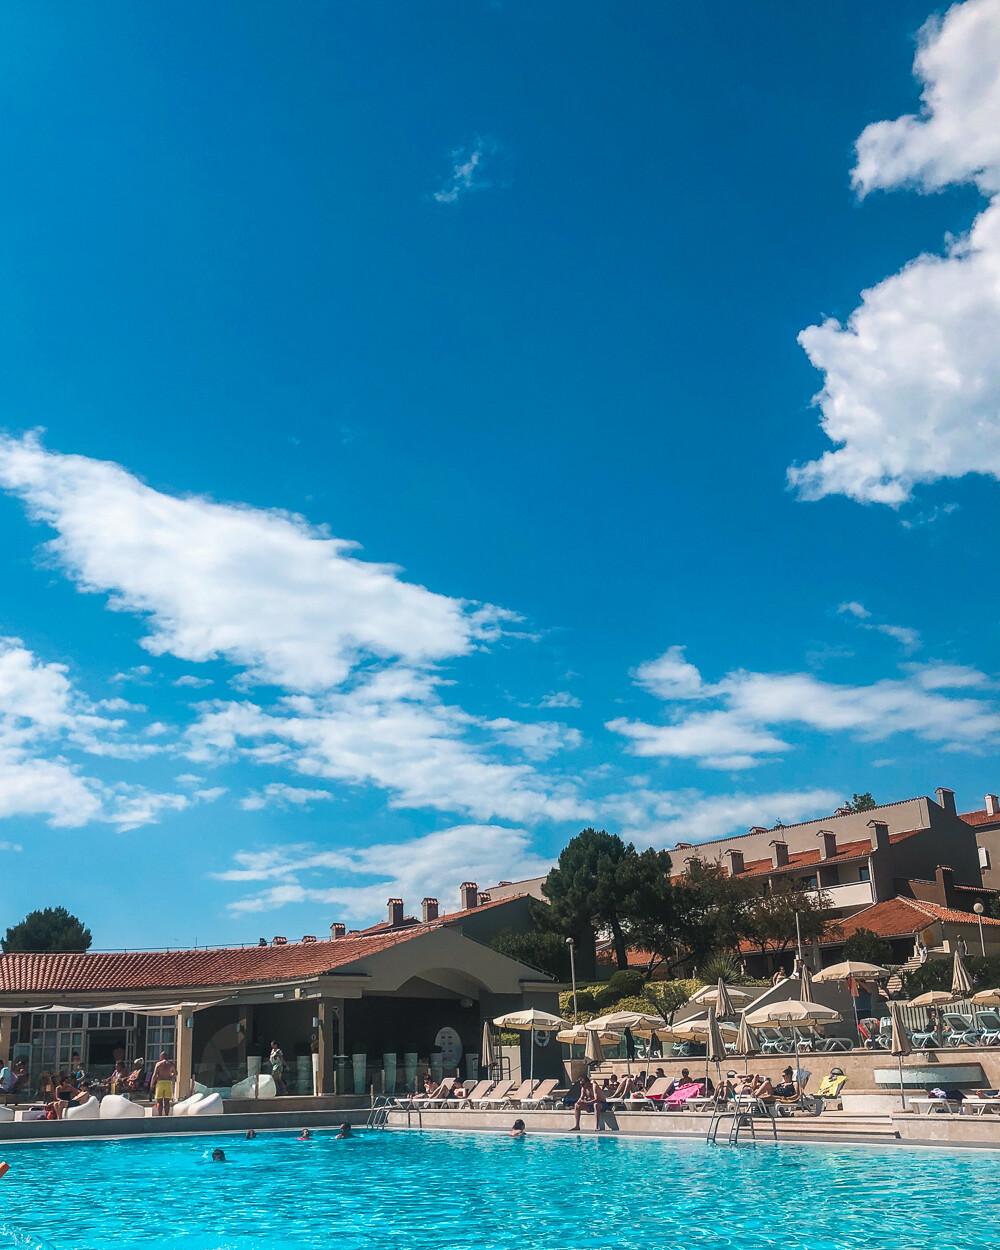 Park Plaza Histria Pula in Croatia